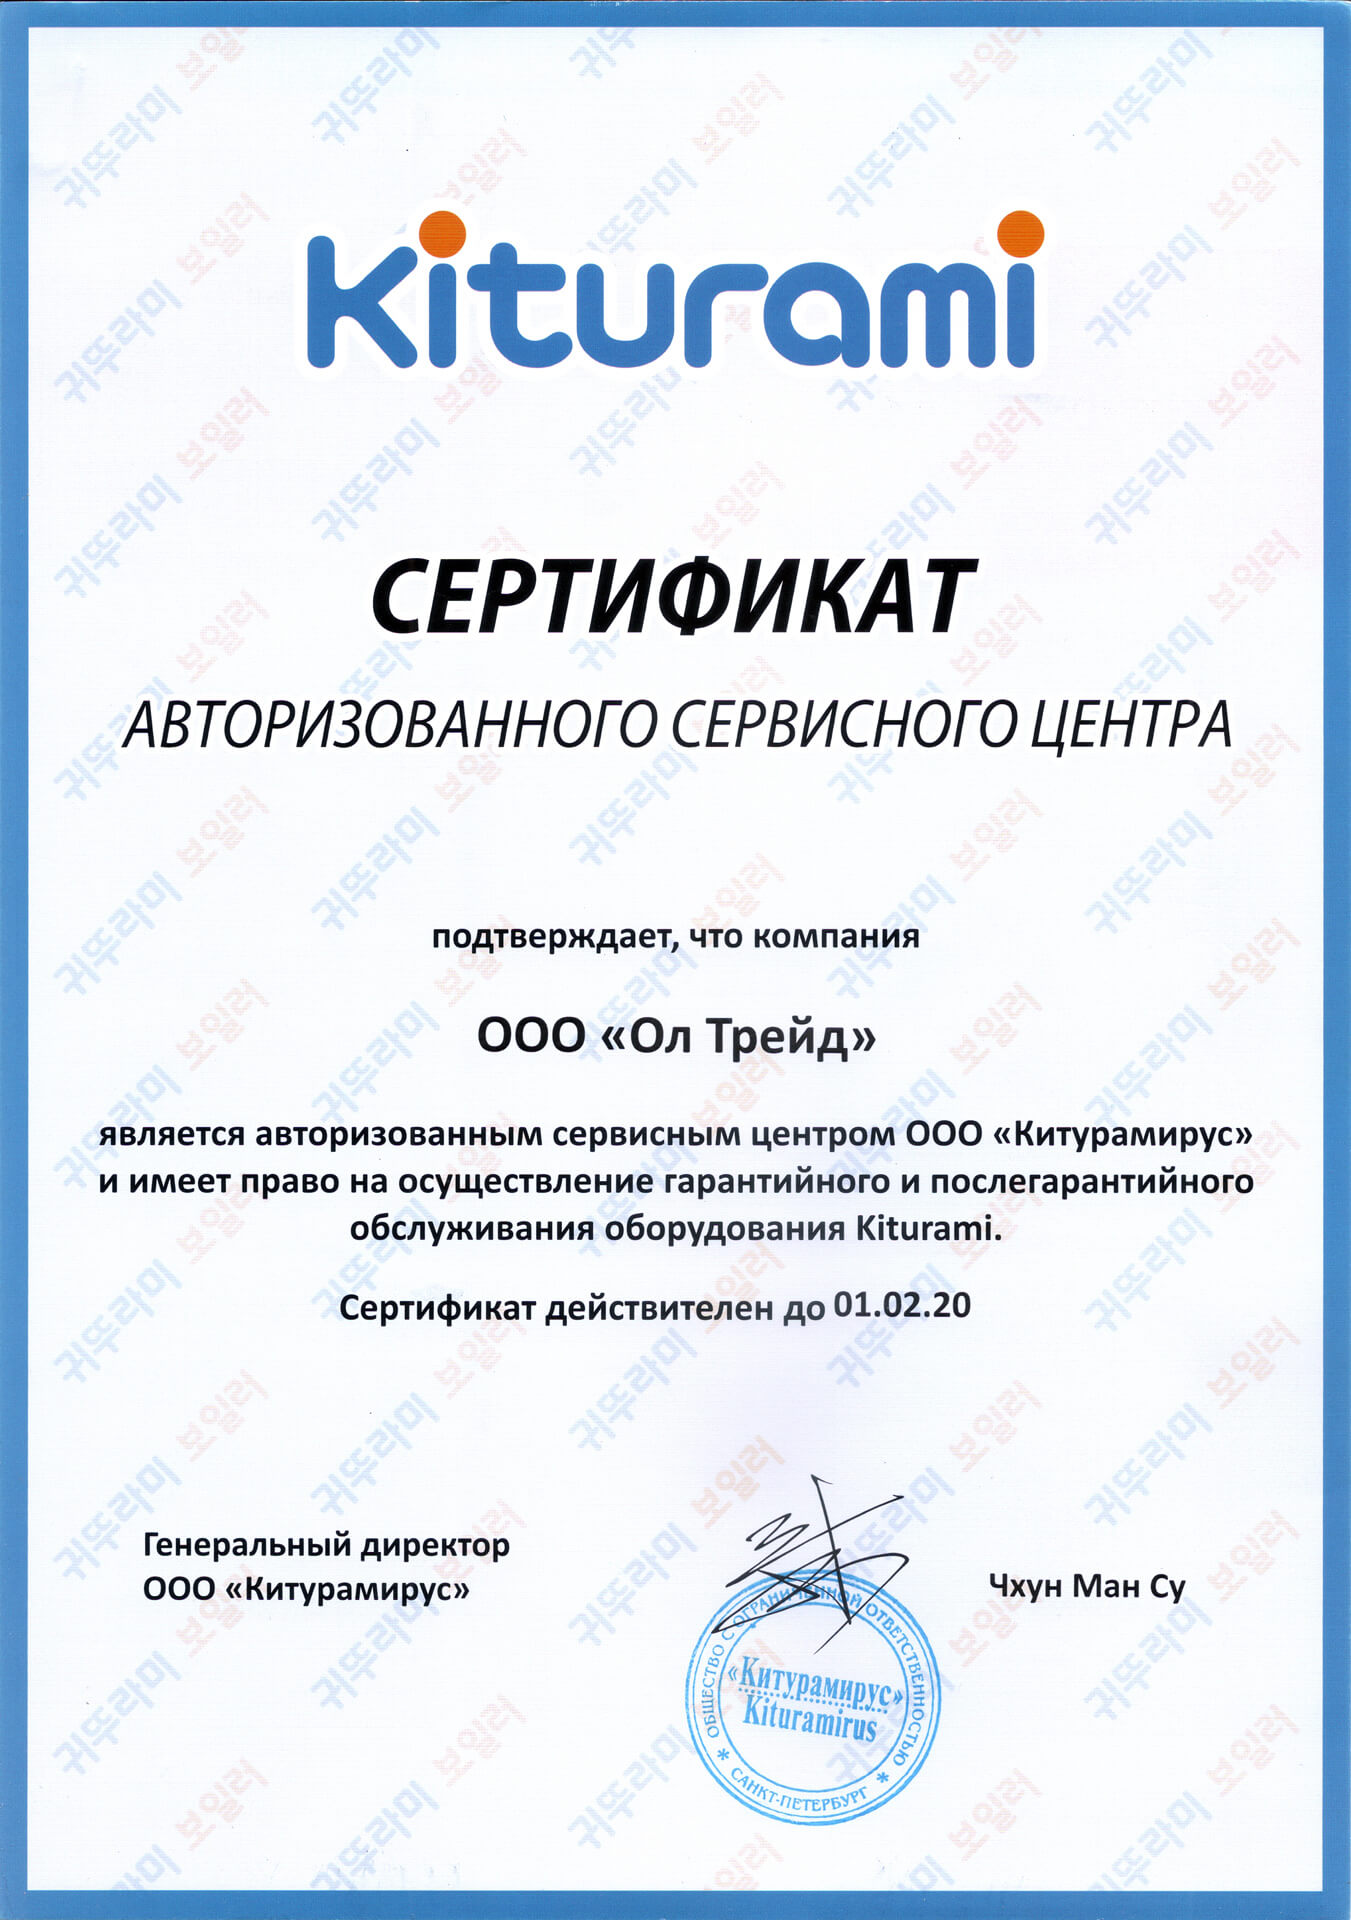 Сертификат KITURAMI